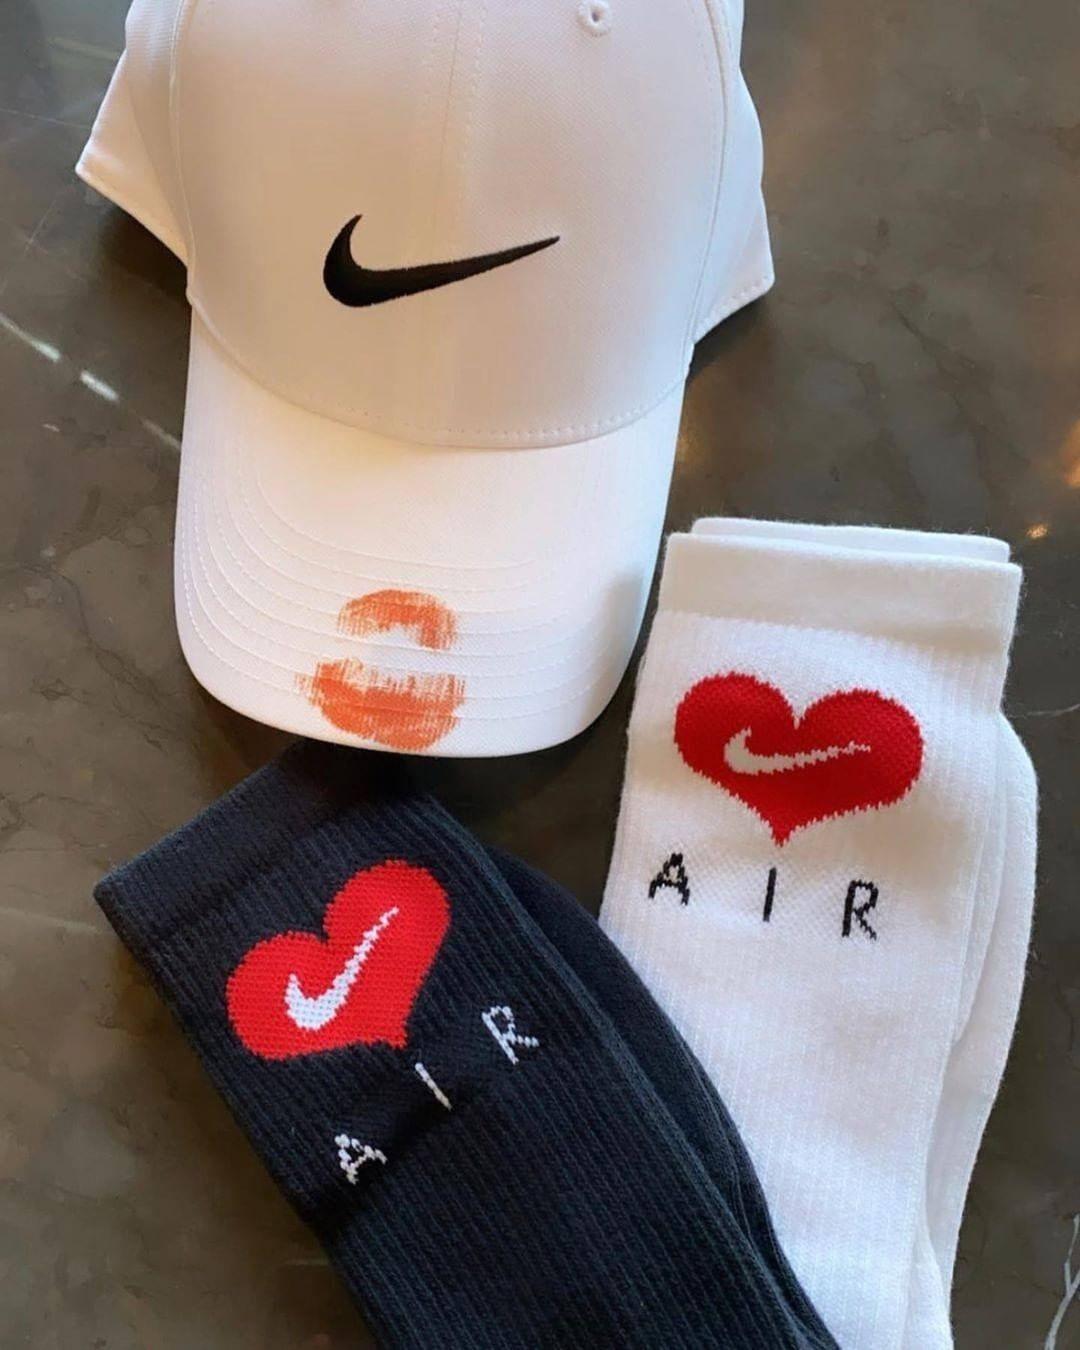 Drake Nike Certified Lover Boy Merchandising cappellini e calzini